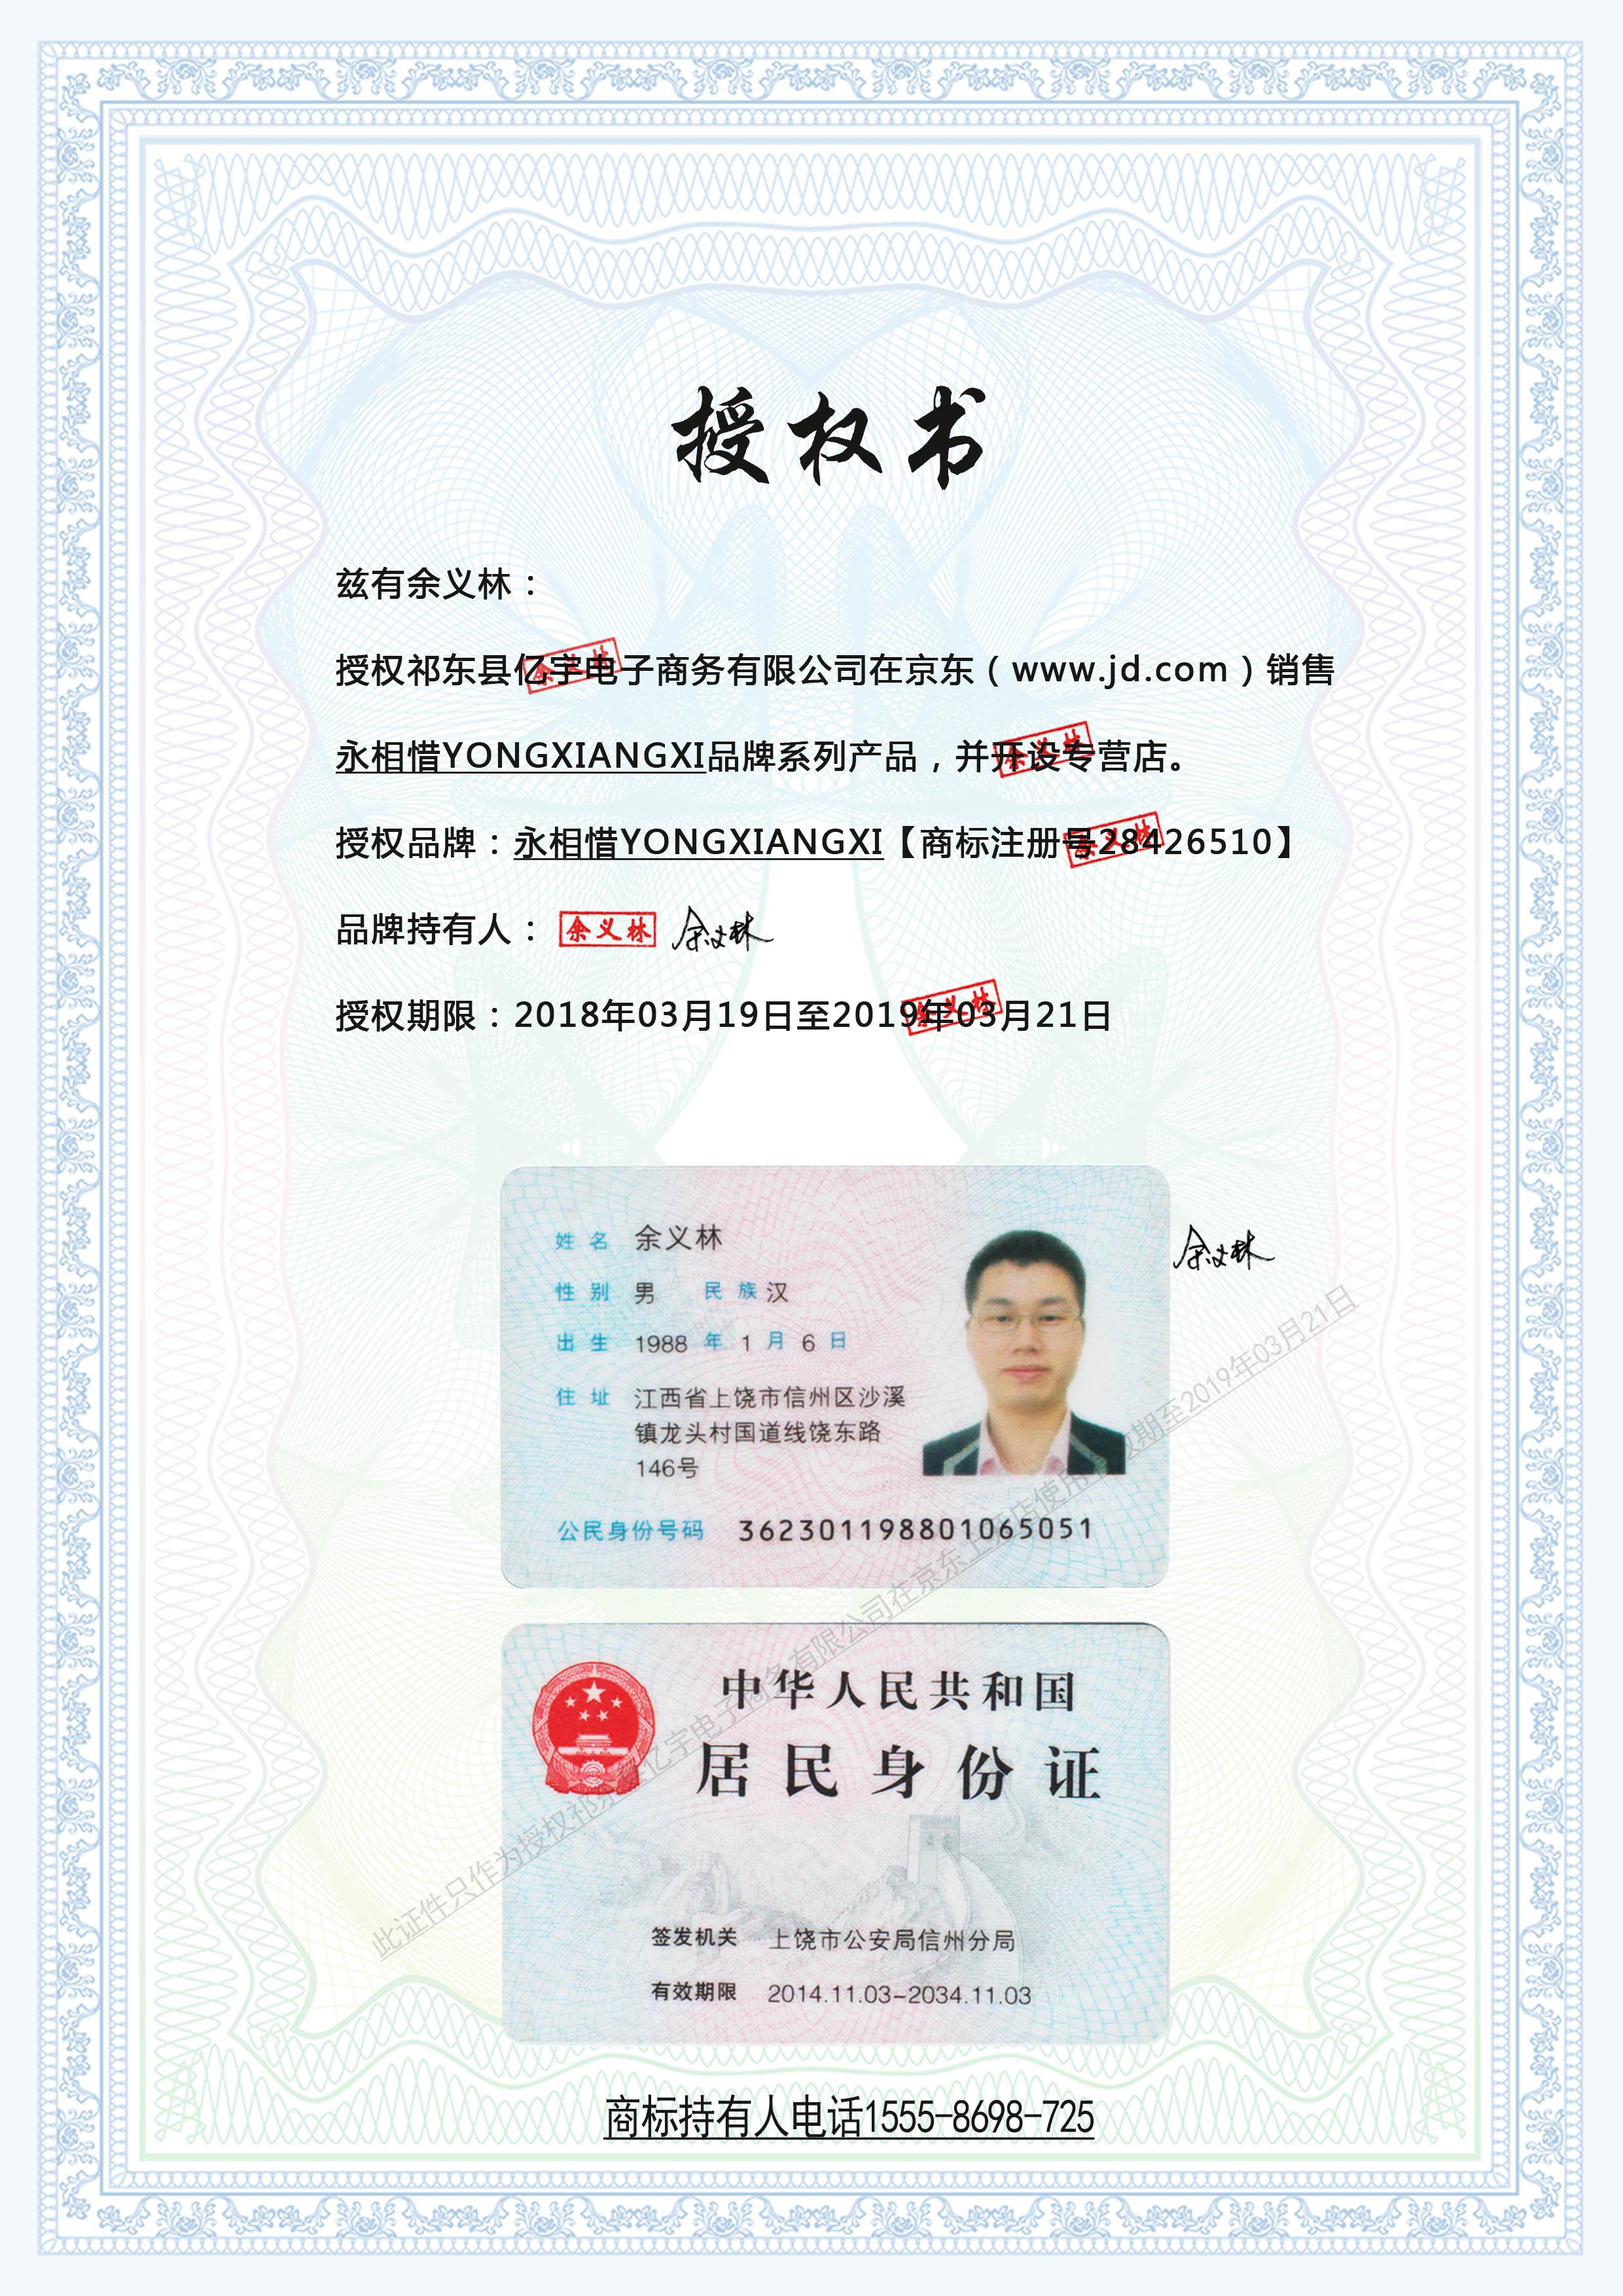 永相惜(Yongxiangxi)